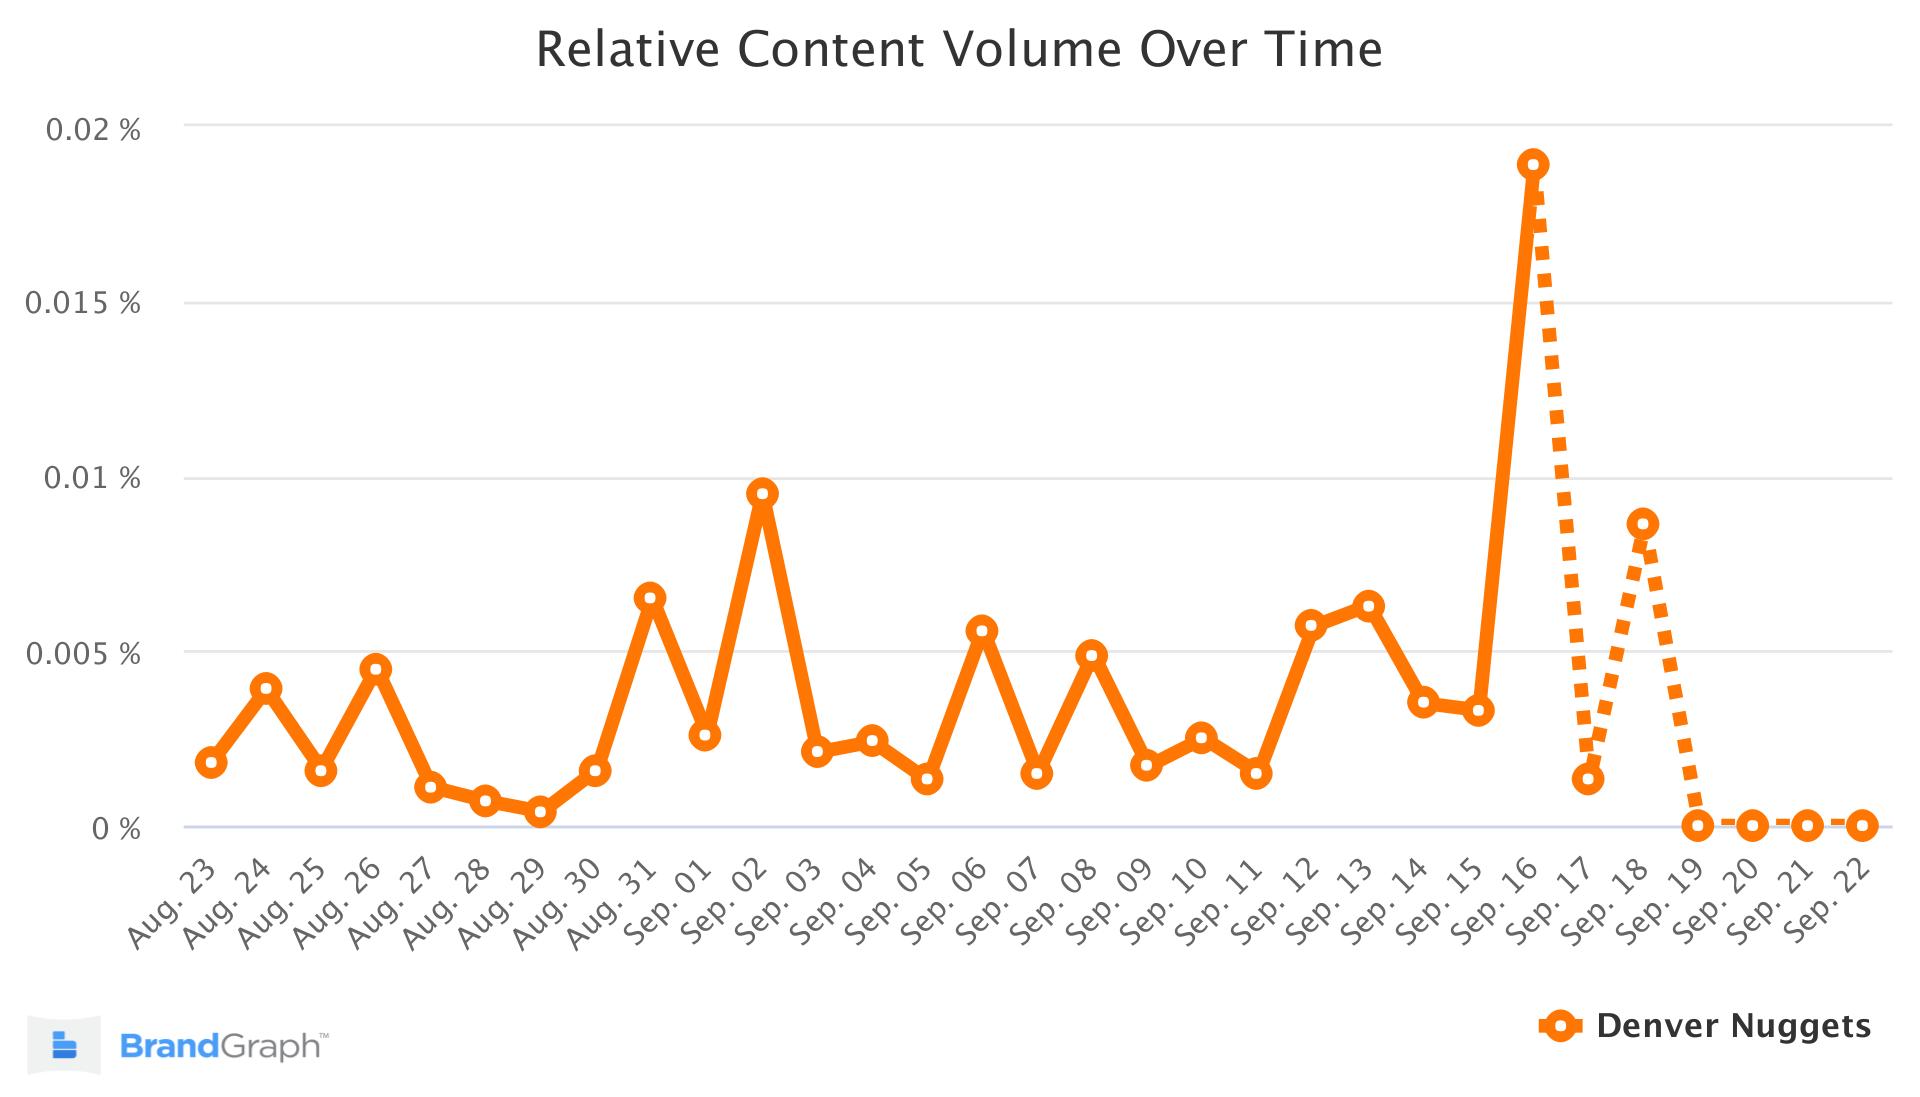 denver nuggets brandgraph trend chart